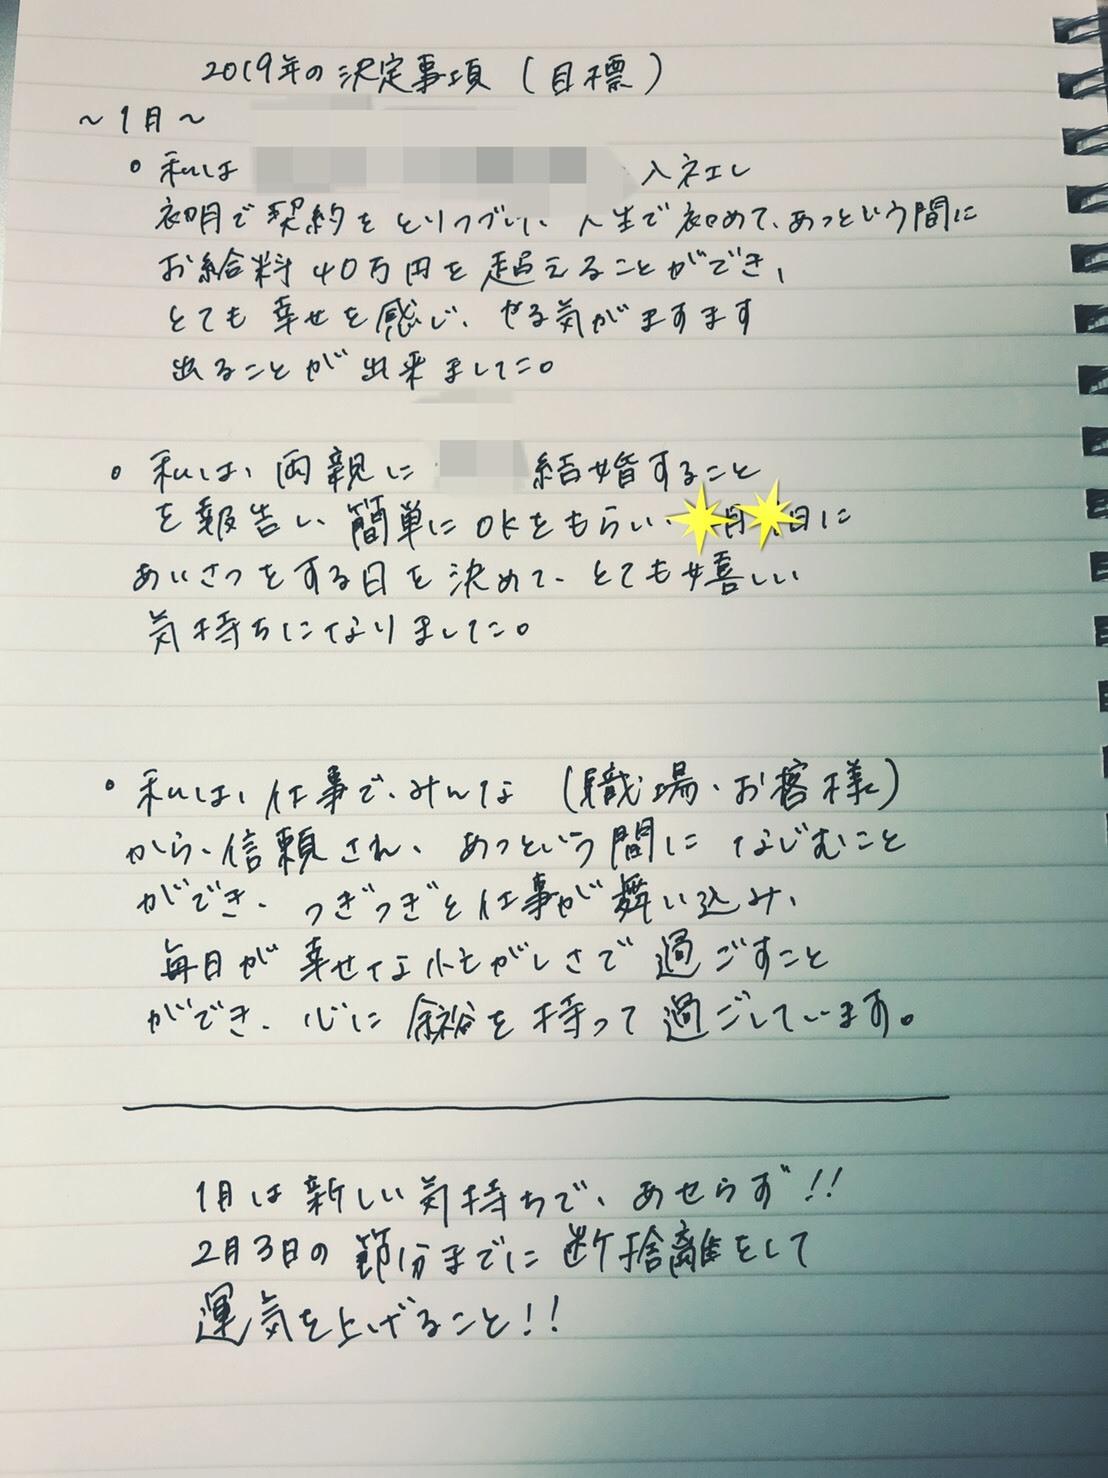 S__14852122.jpg